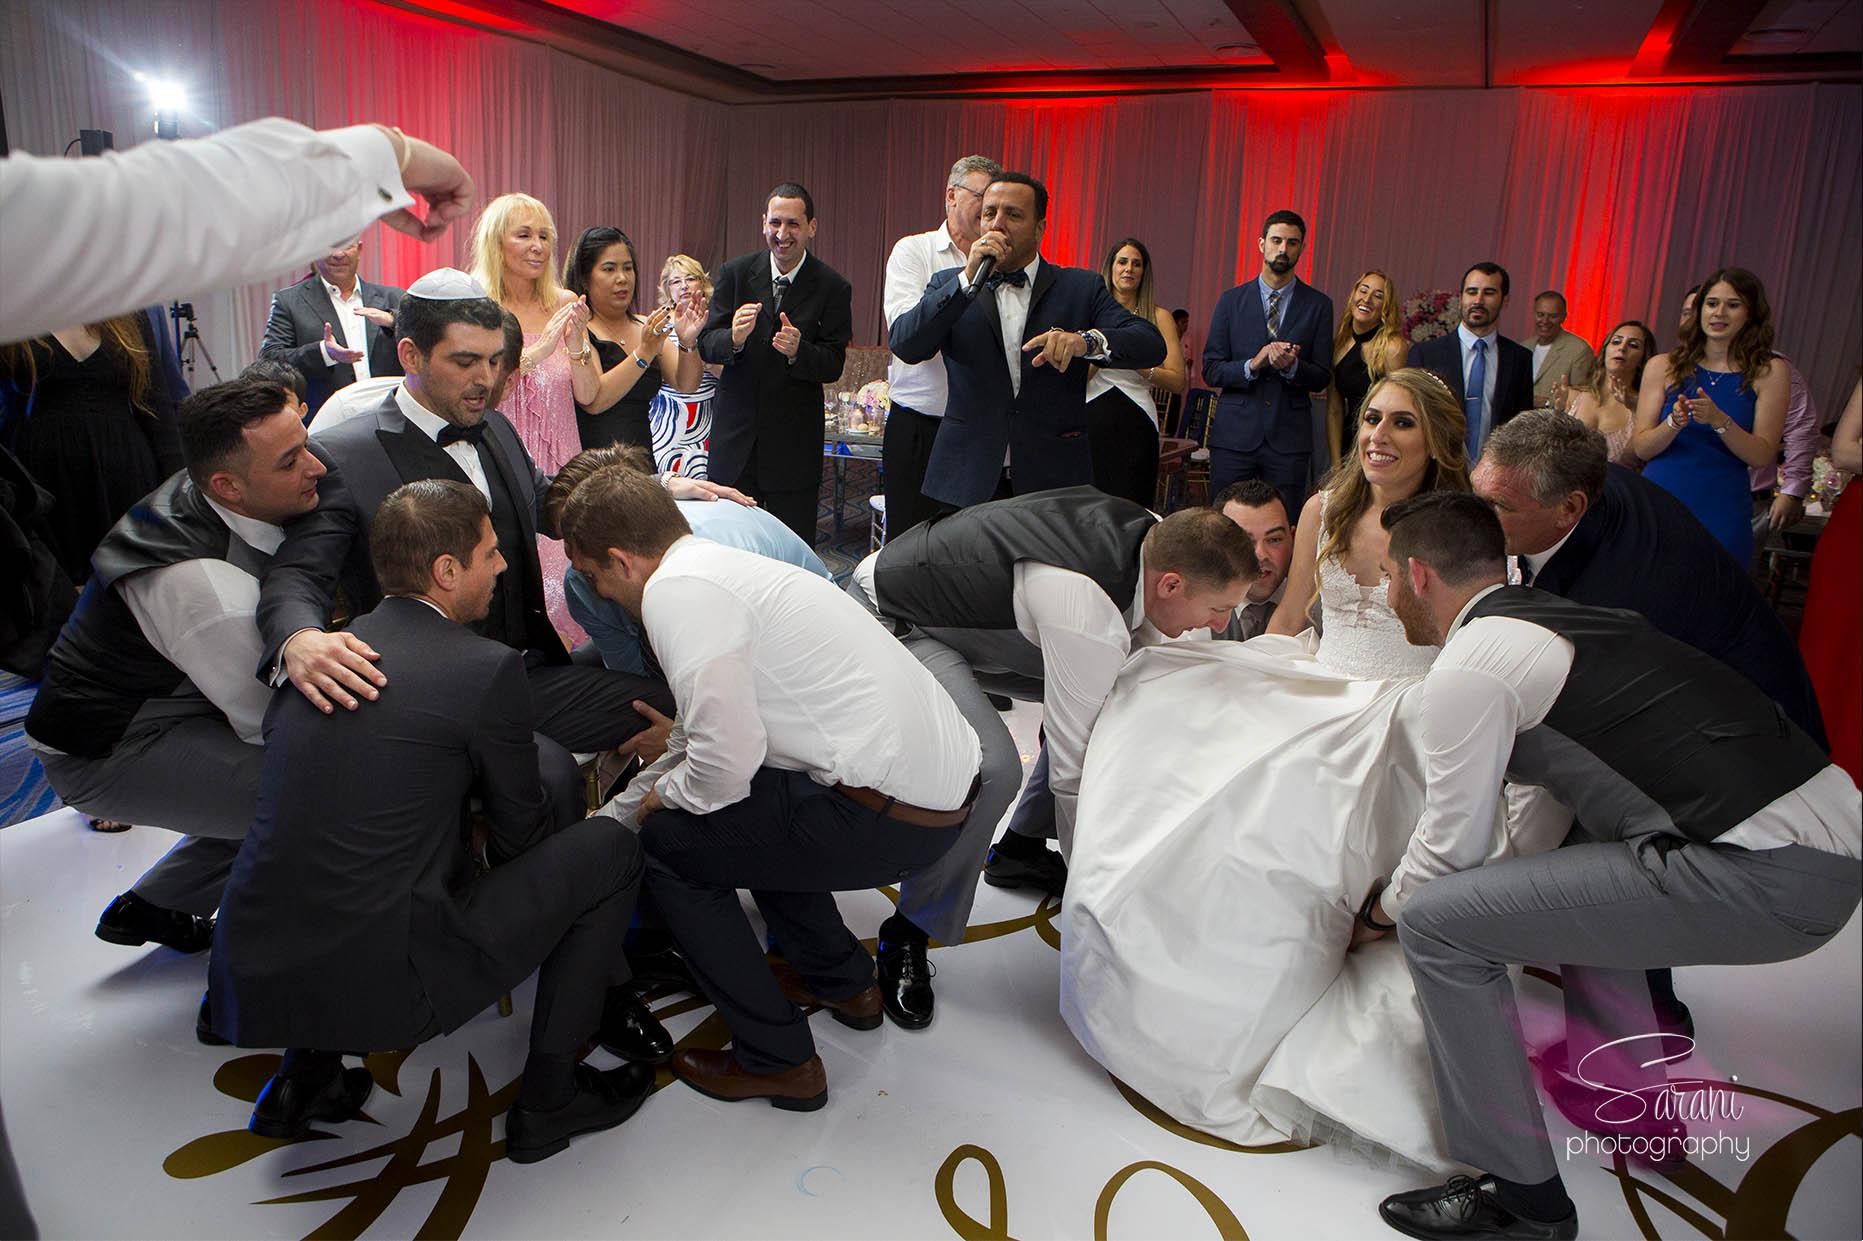 Jewish Wedding Photography Royalton Riviera Cancun